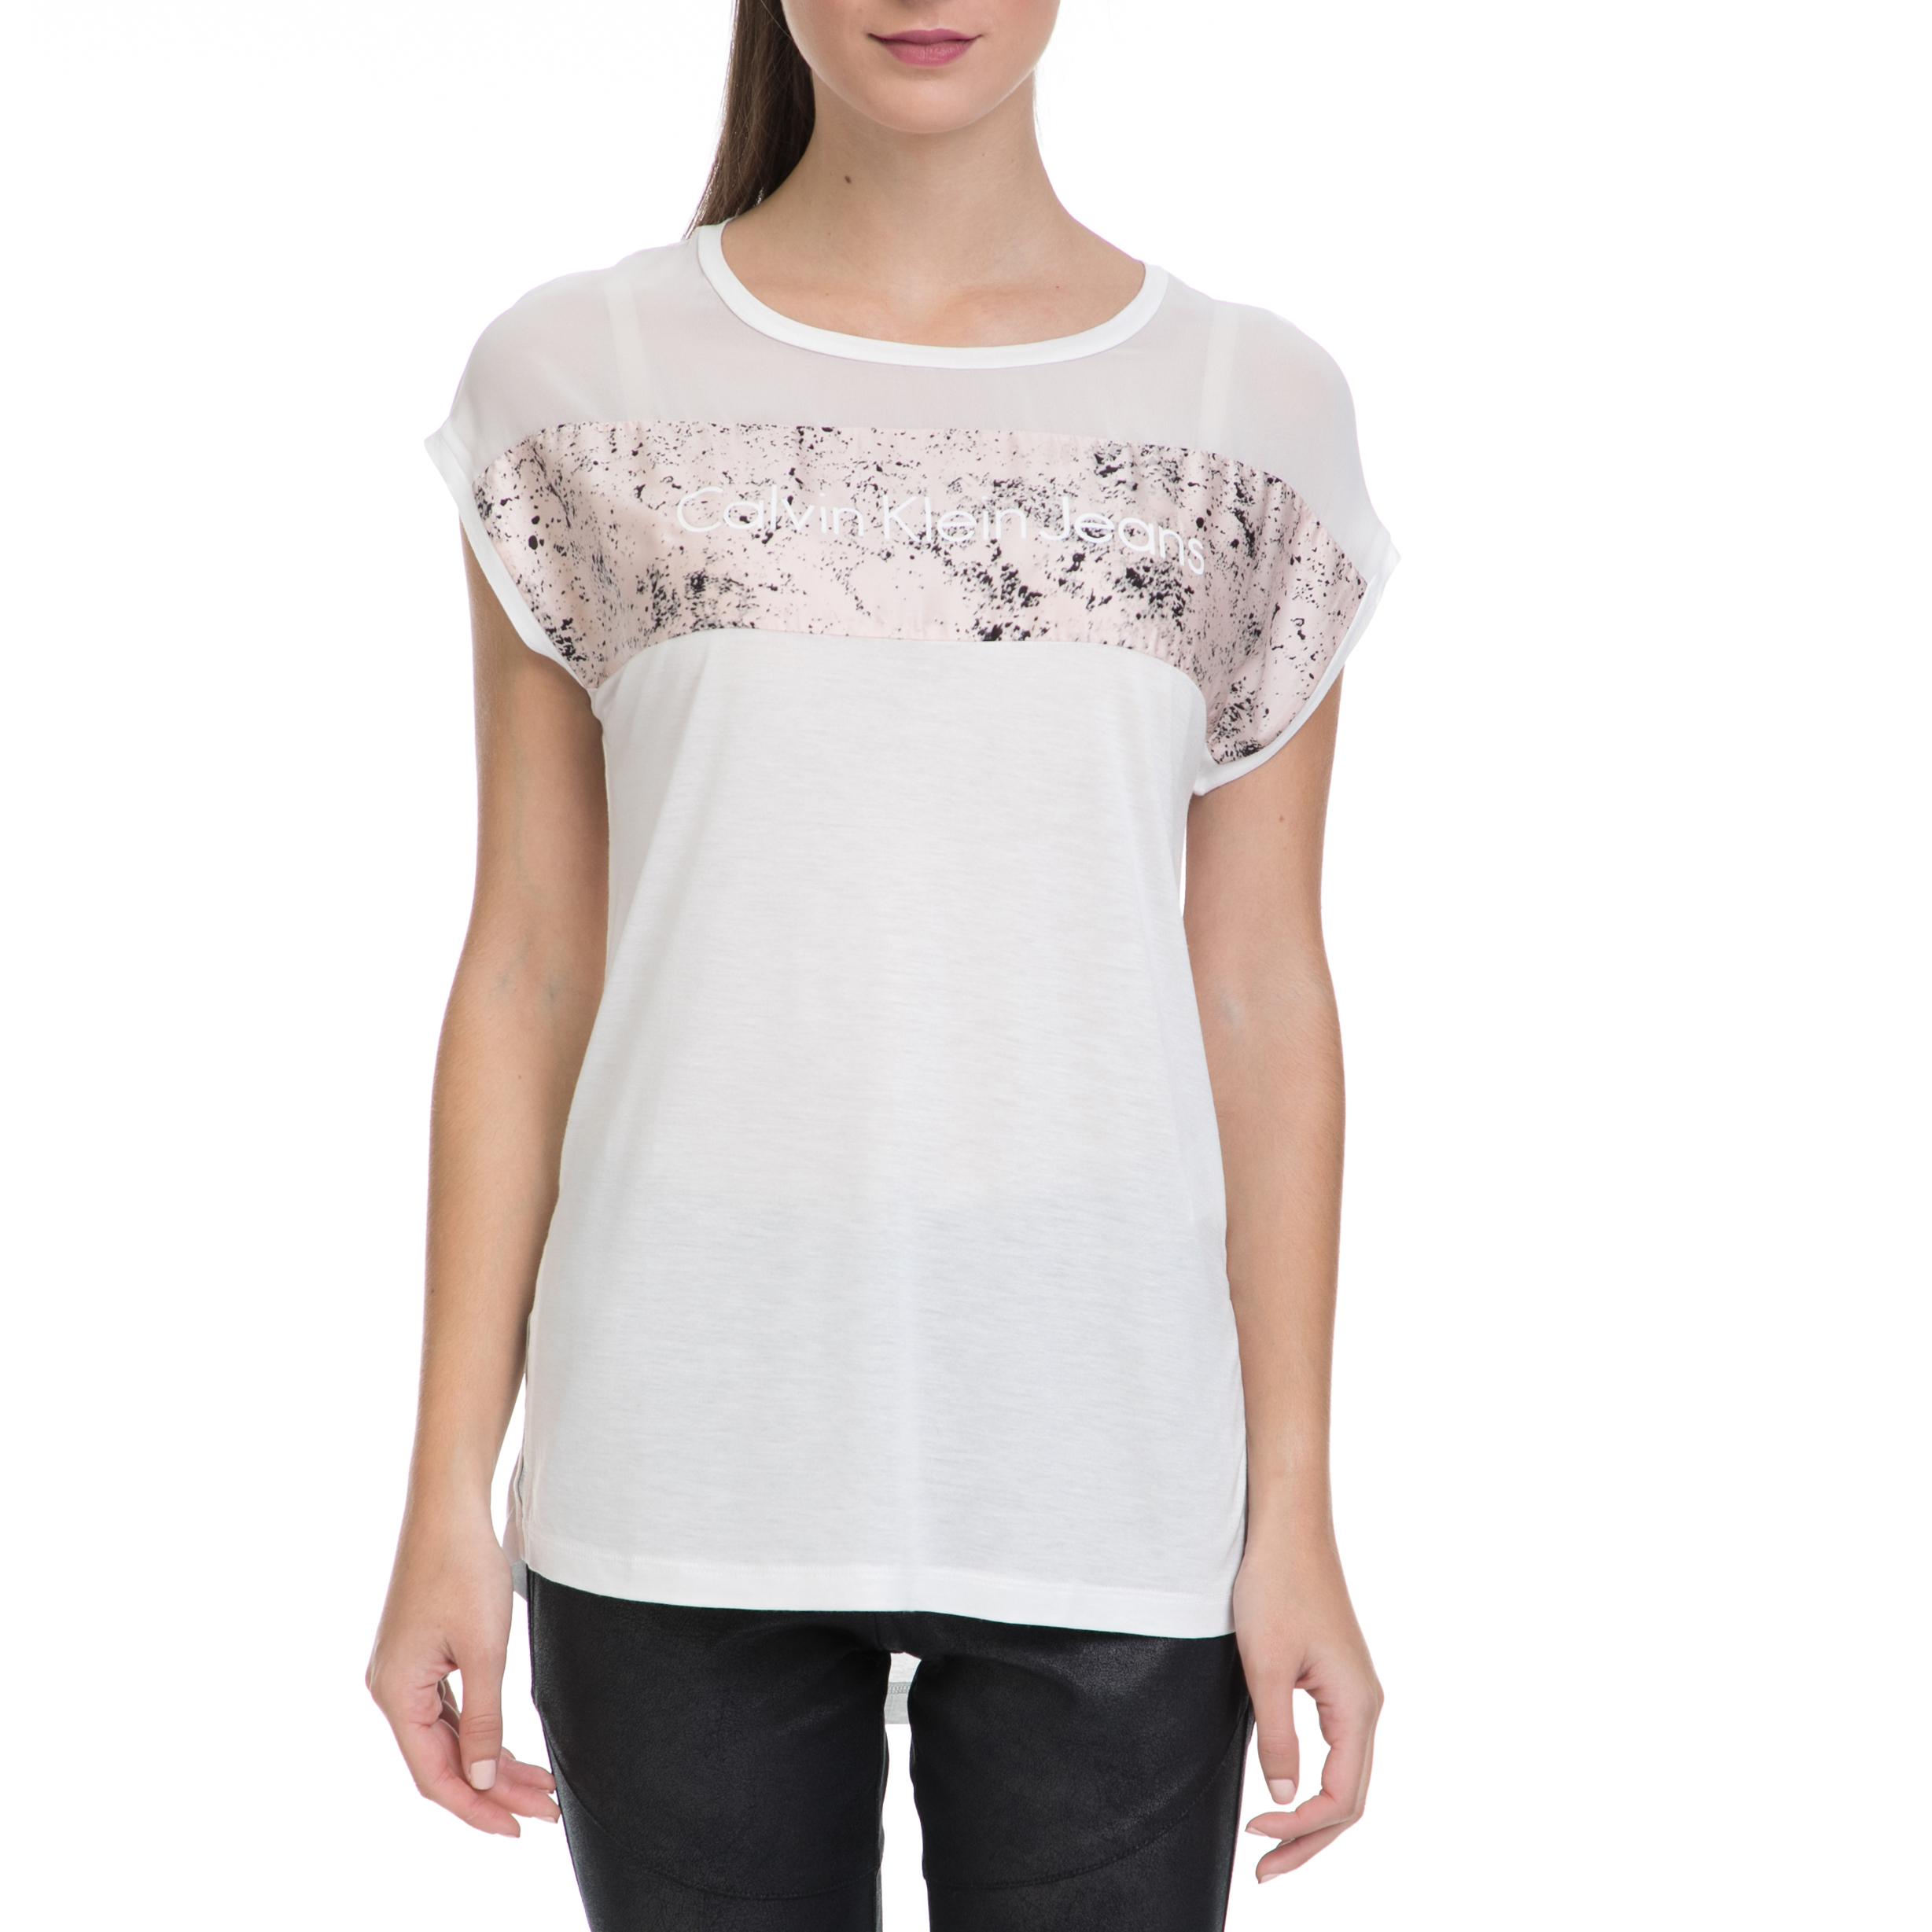 CALVIN KLEIN JEANS – Γυναικεία μπλούζα TIKA-31 CN LWK λευκή